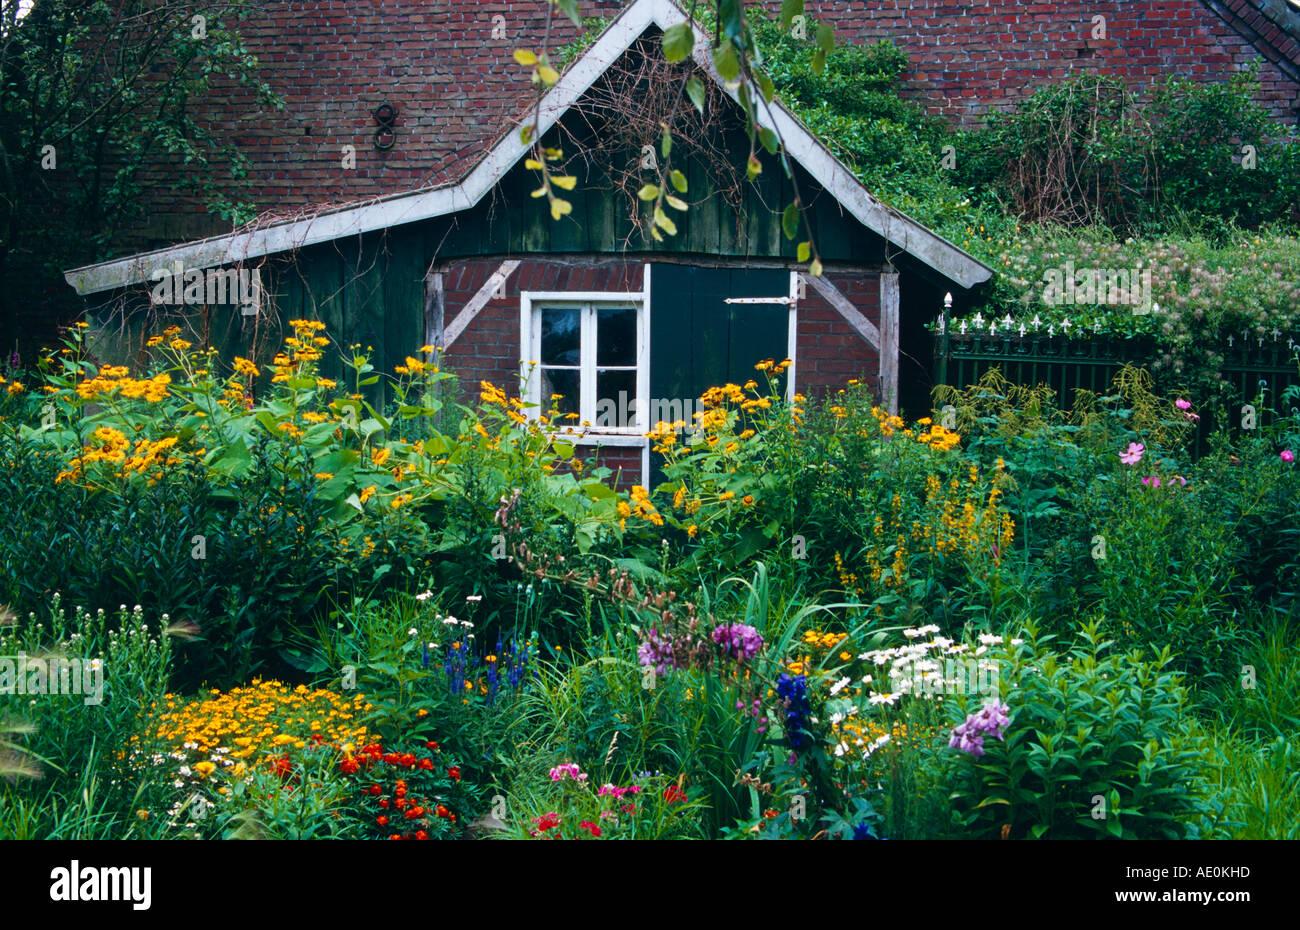 Garten deutschland Alemania jardín hermoso aspecto Imagen De Stock